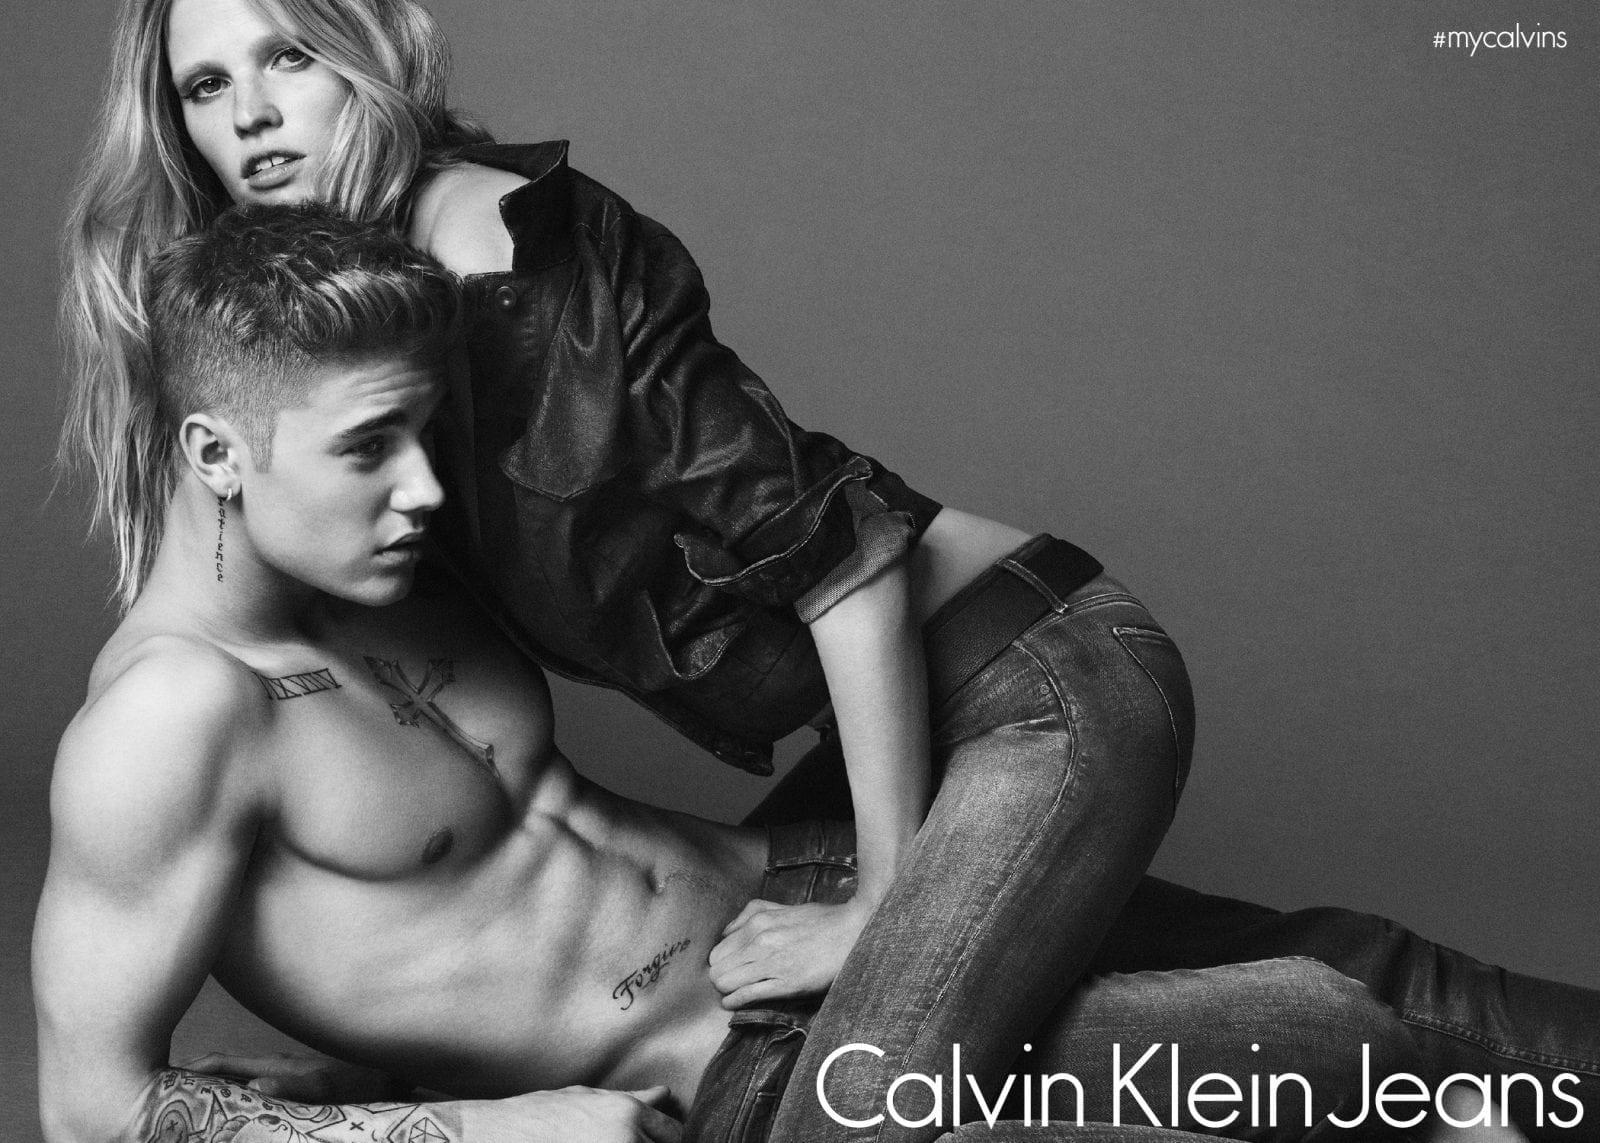 Justin Bieber Lara Stone - Justin Bieber este noul model Calvin Klein Jeans